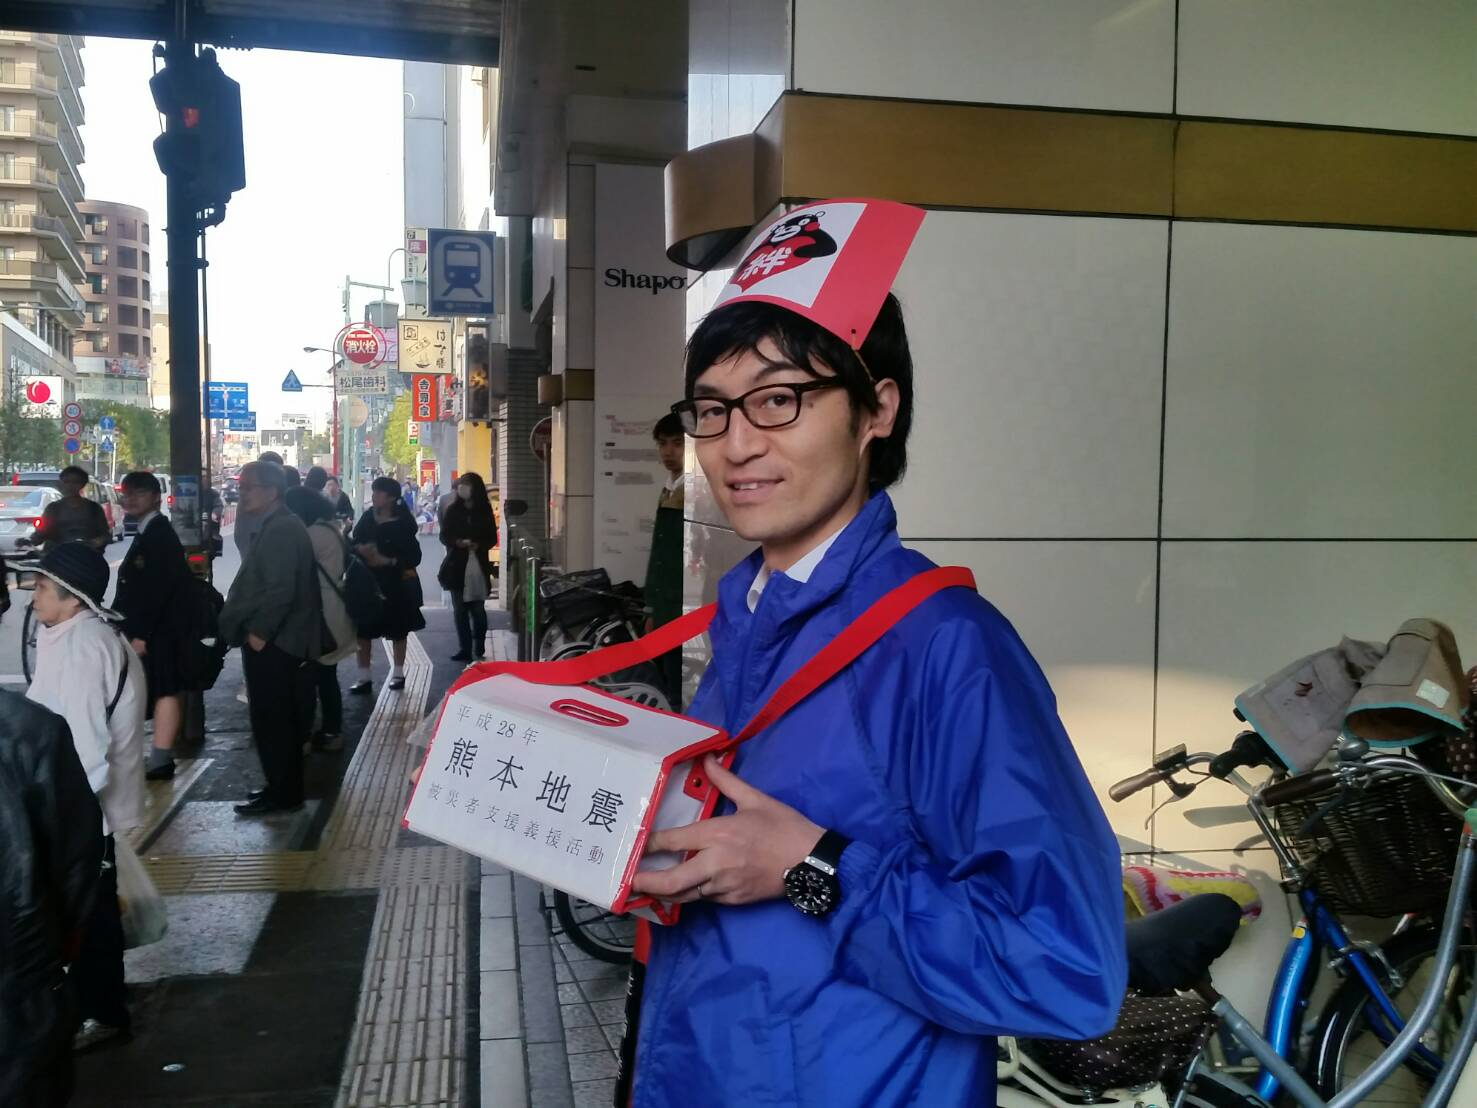 本八幡駅前で熊本地震の義援金活動